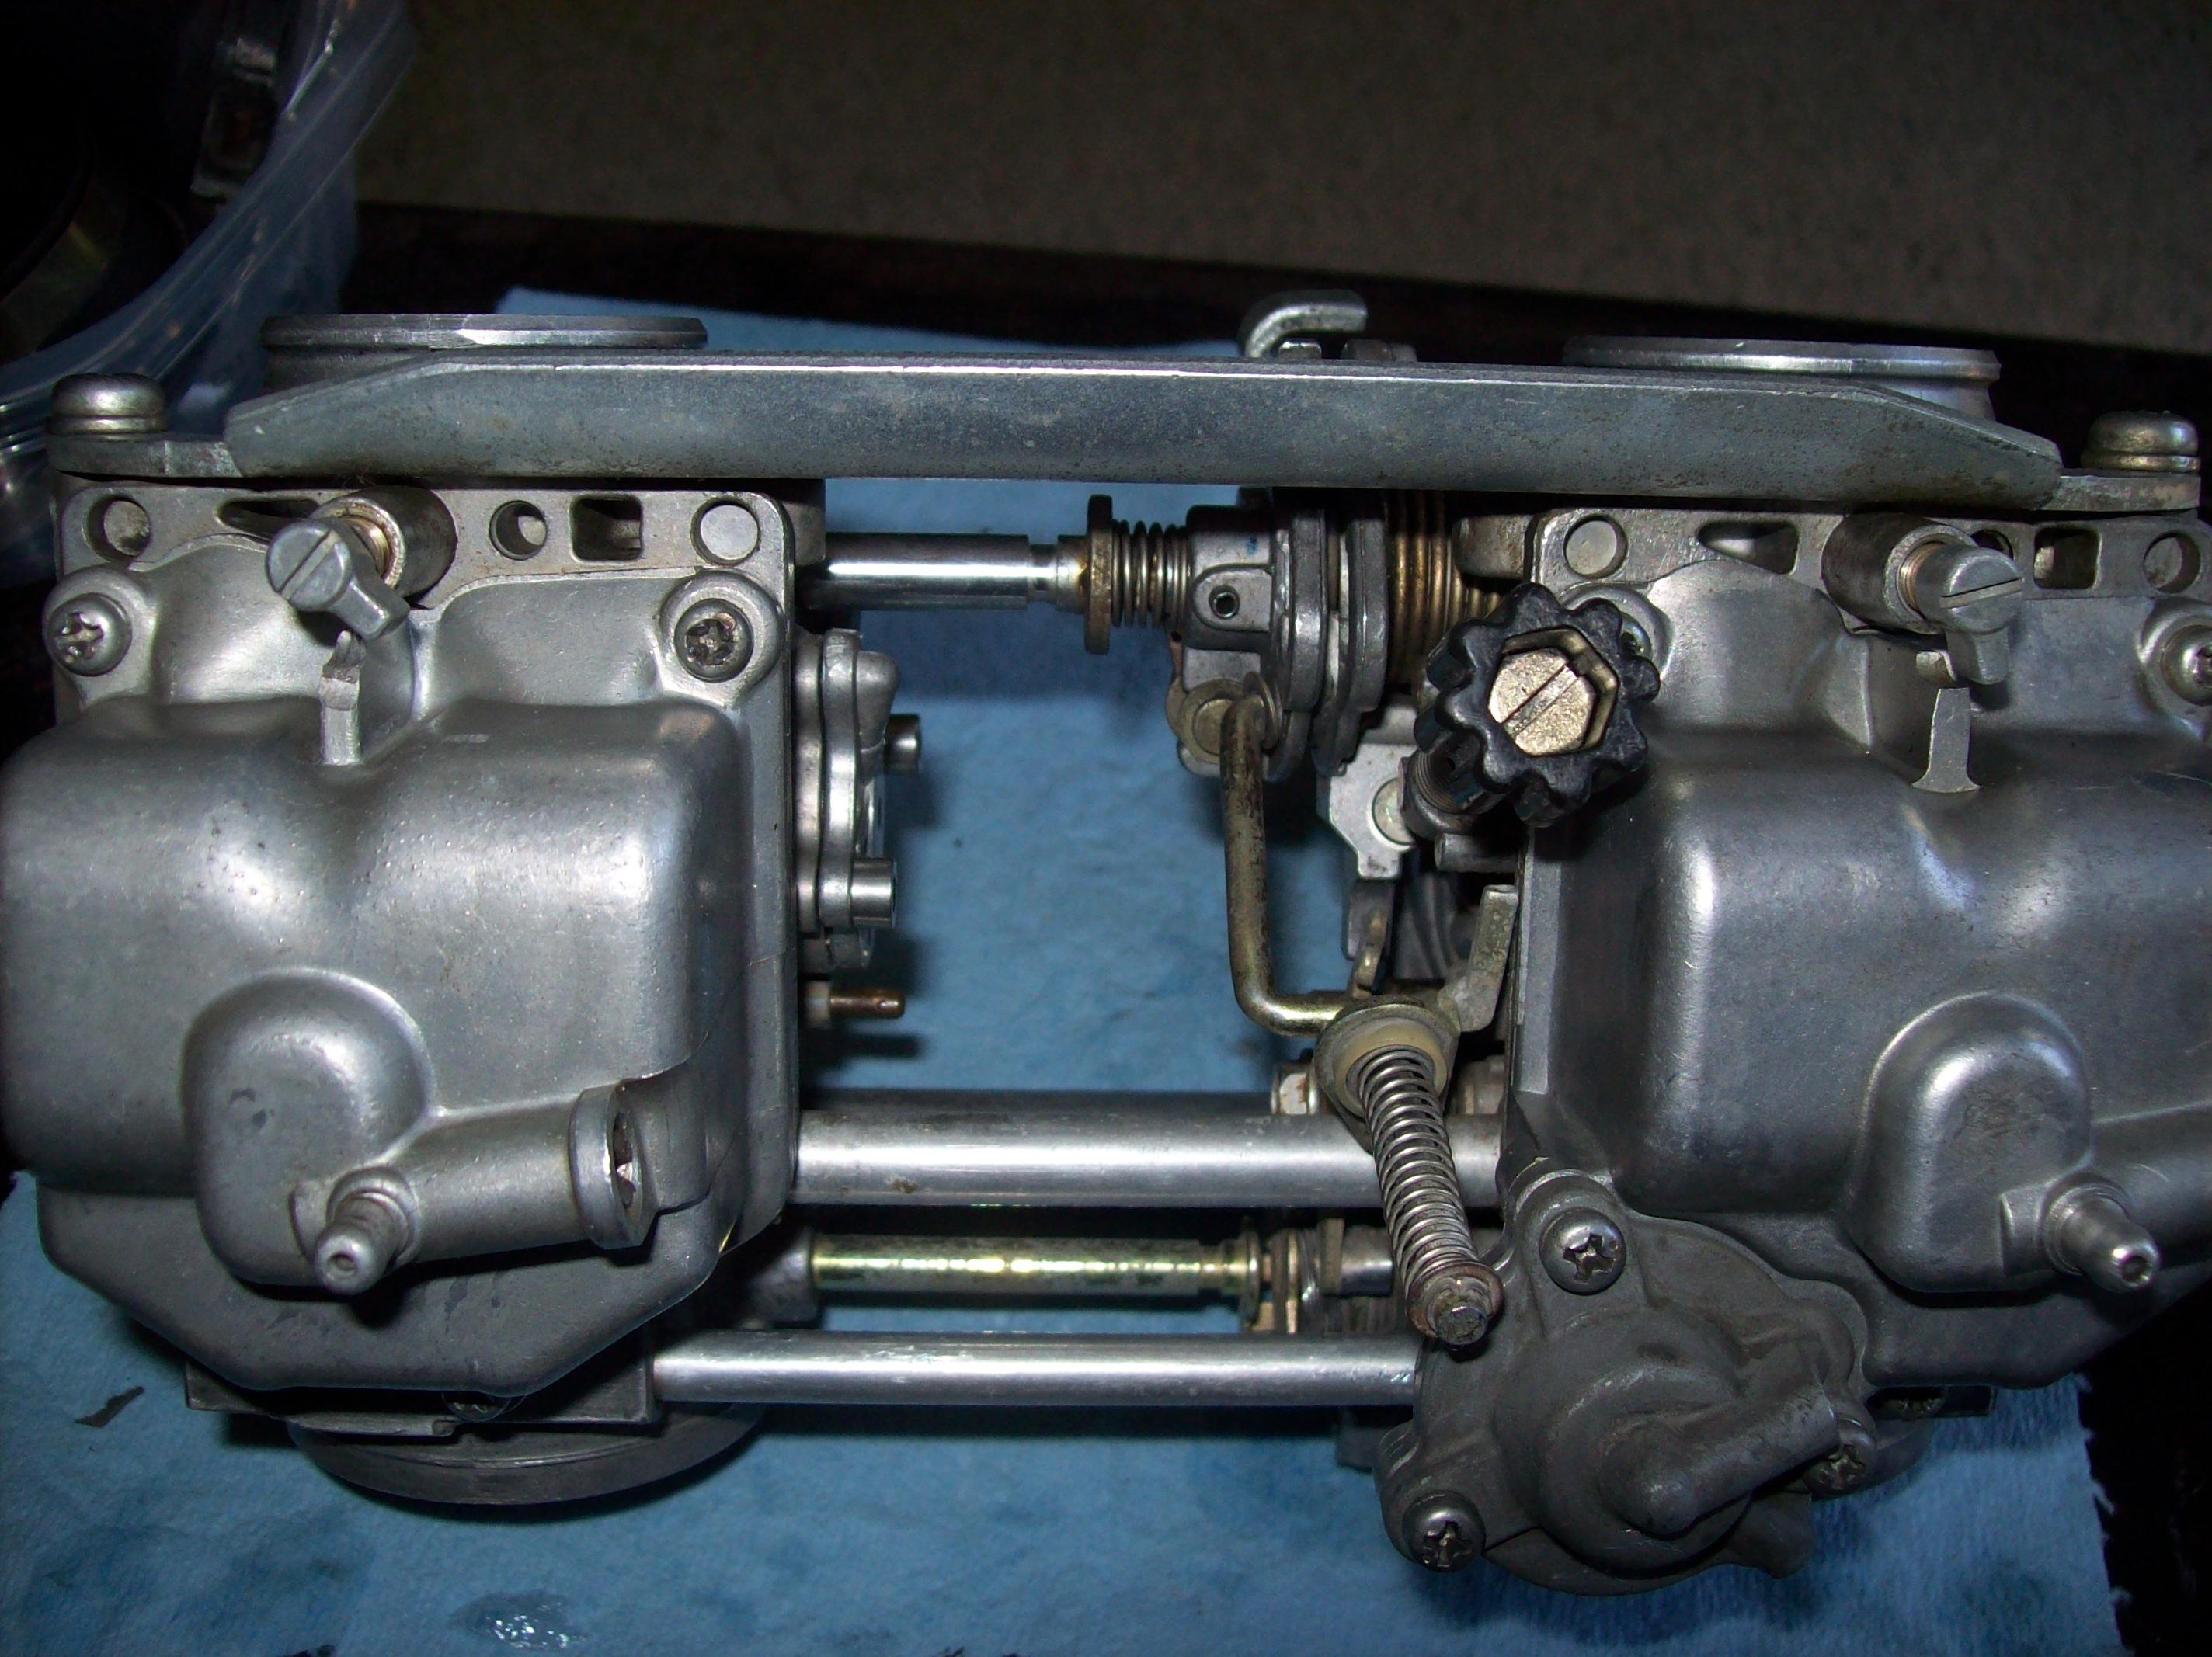 Rebuilding Vb Carbs Honda Keihin Cv Carburetor Diagram Car Interior Design 201 4648